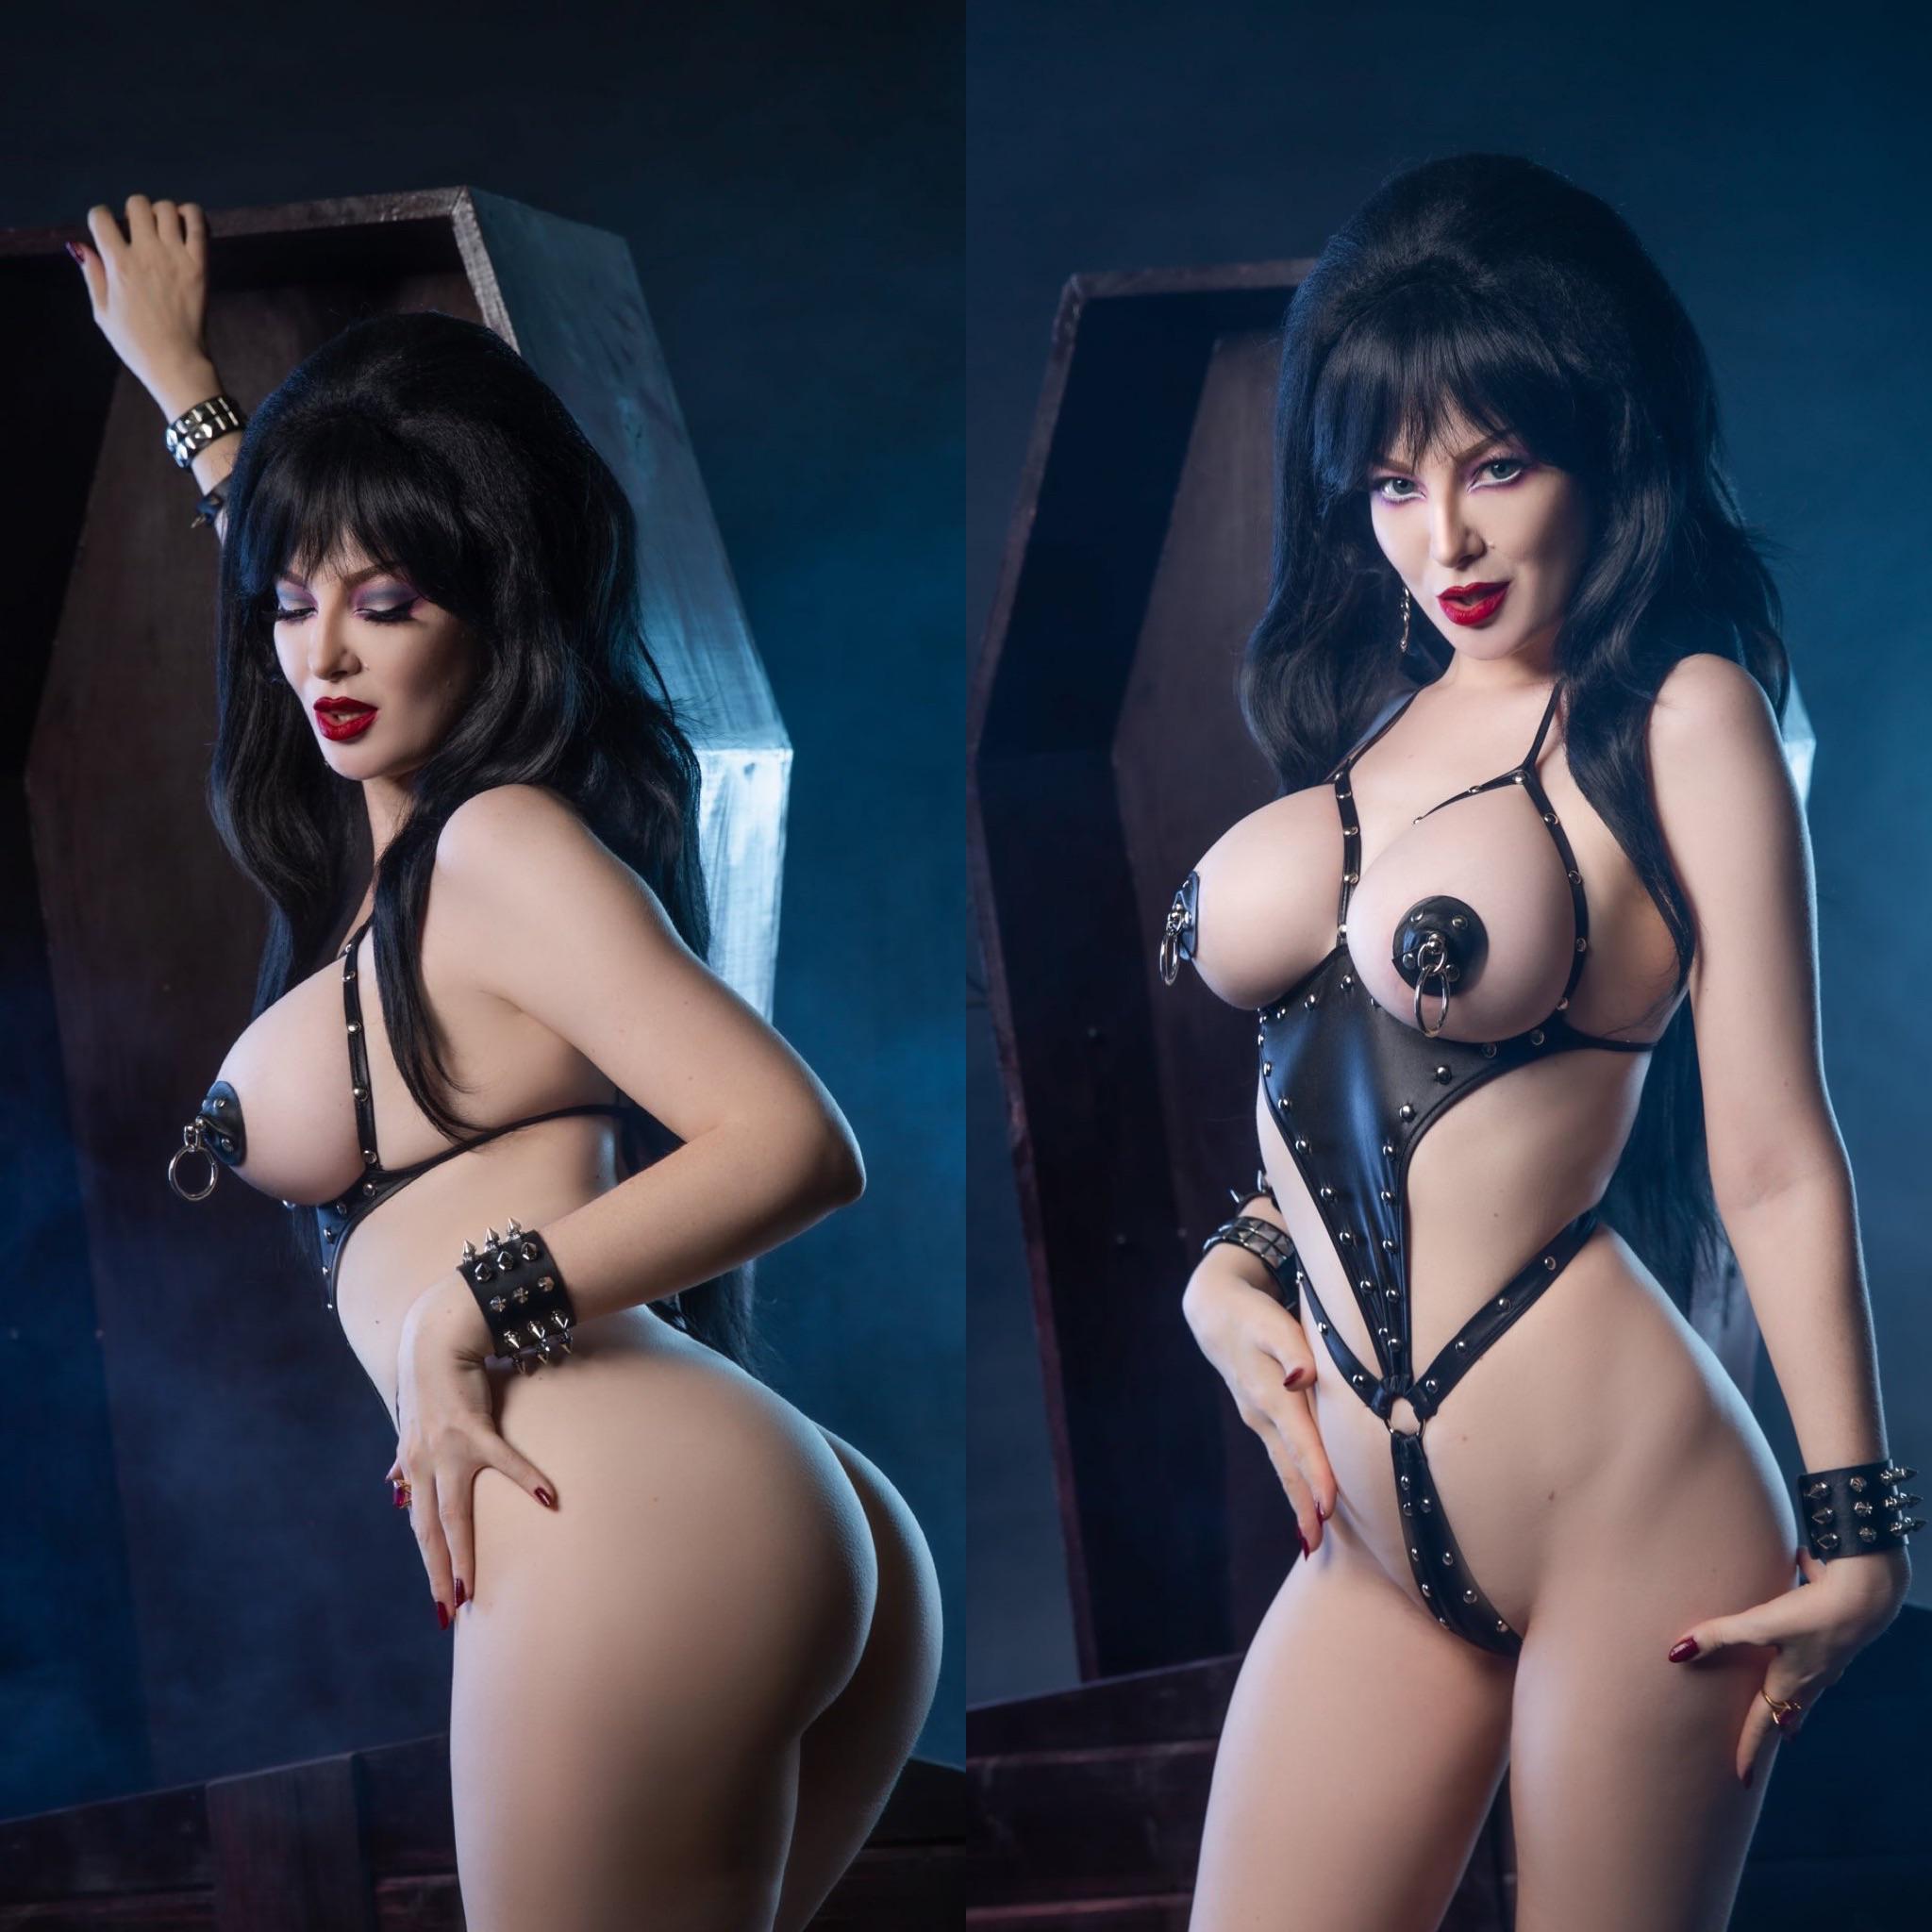 Elvira By Ashlynne Dae